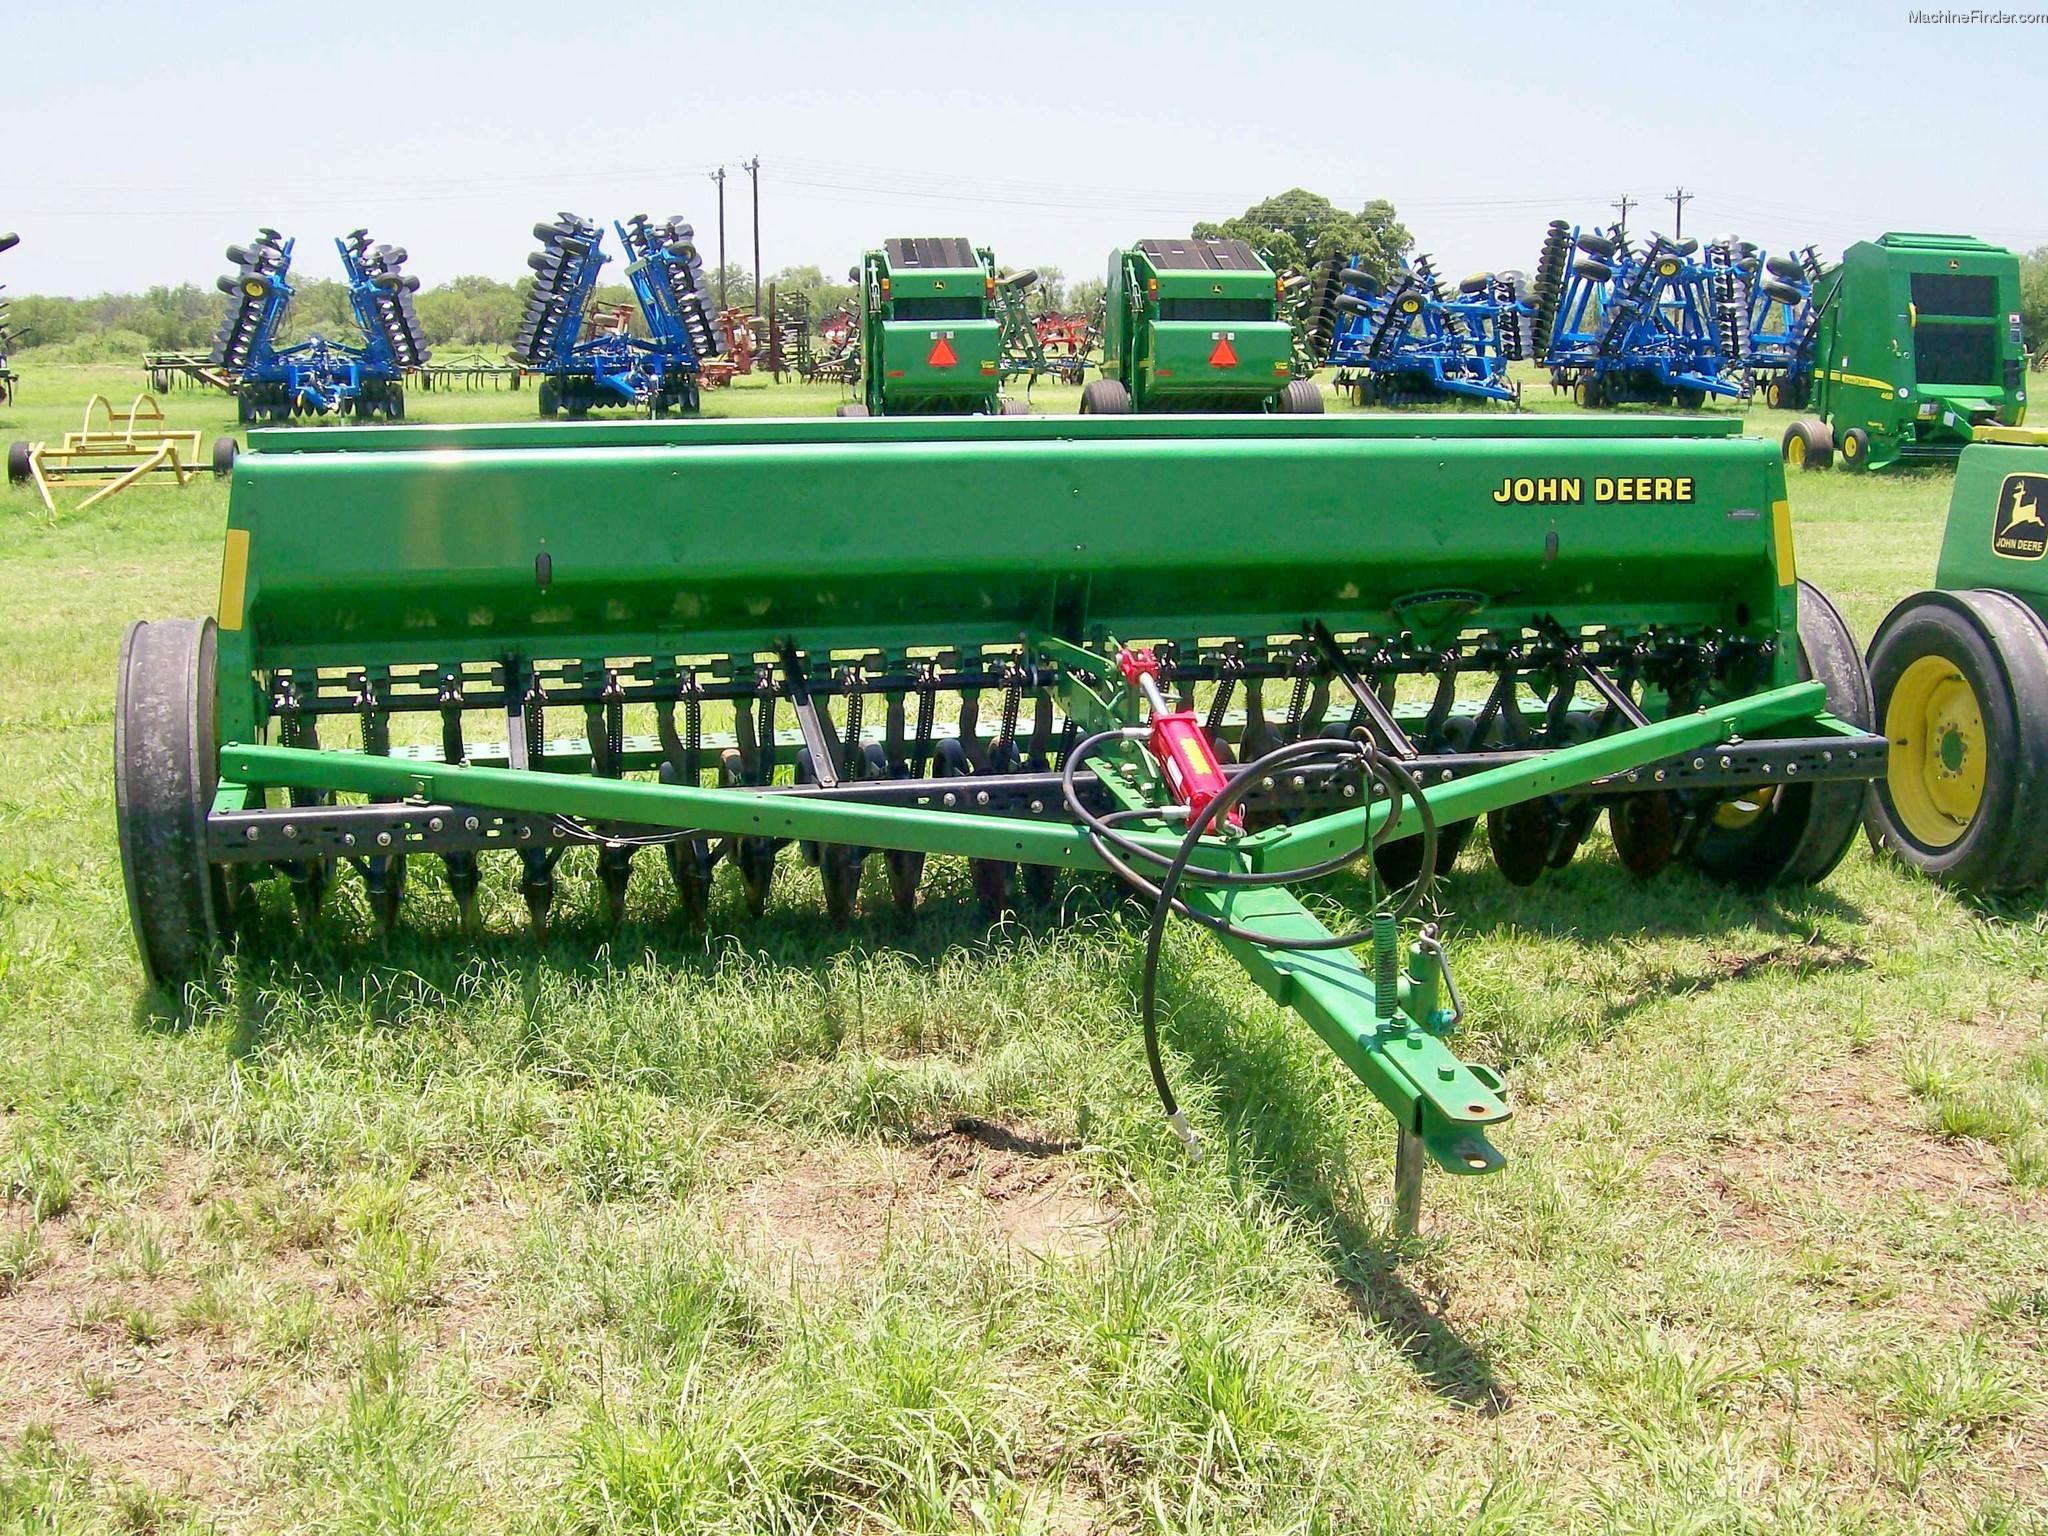 1999 John Deere 450 Planting & Seeding - Box Drills - John ...